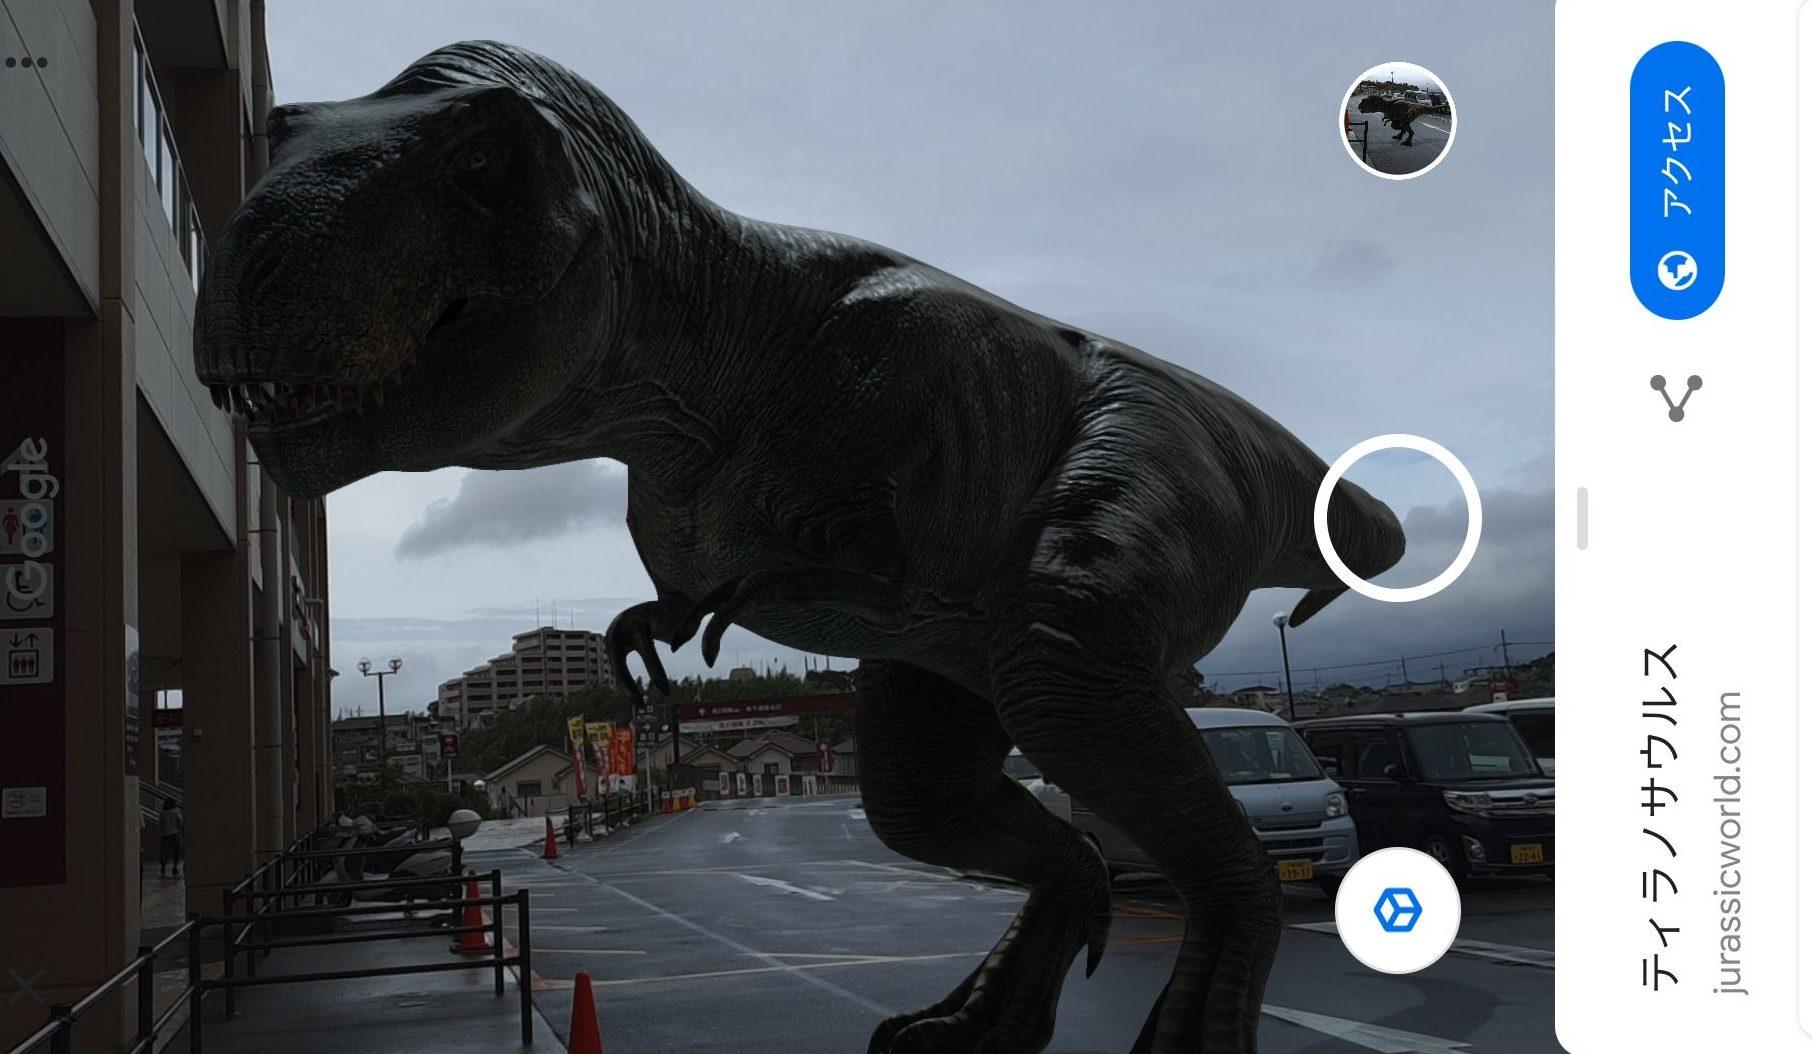 Google検索で恐竜が見れるようになってる♪